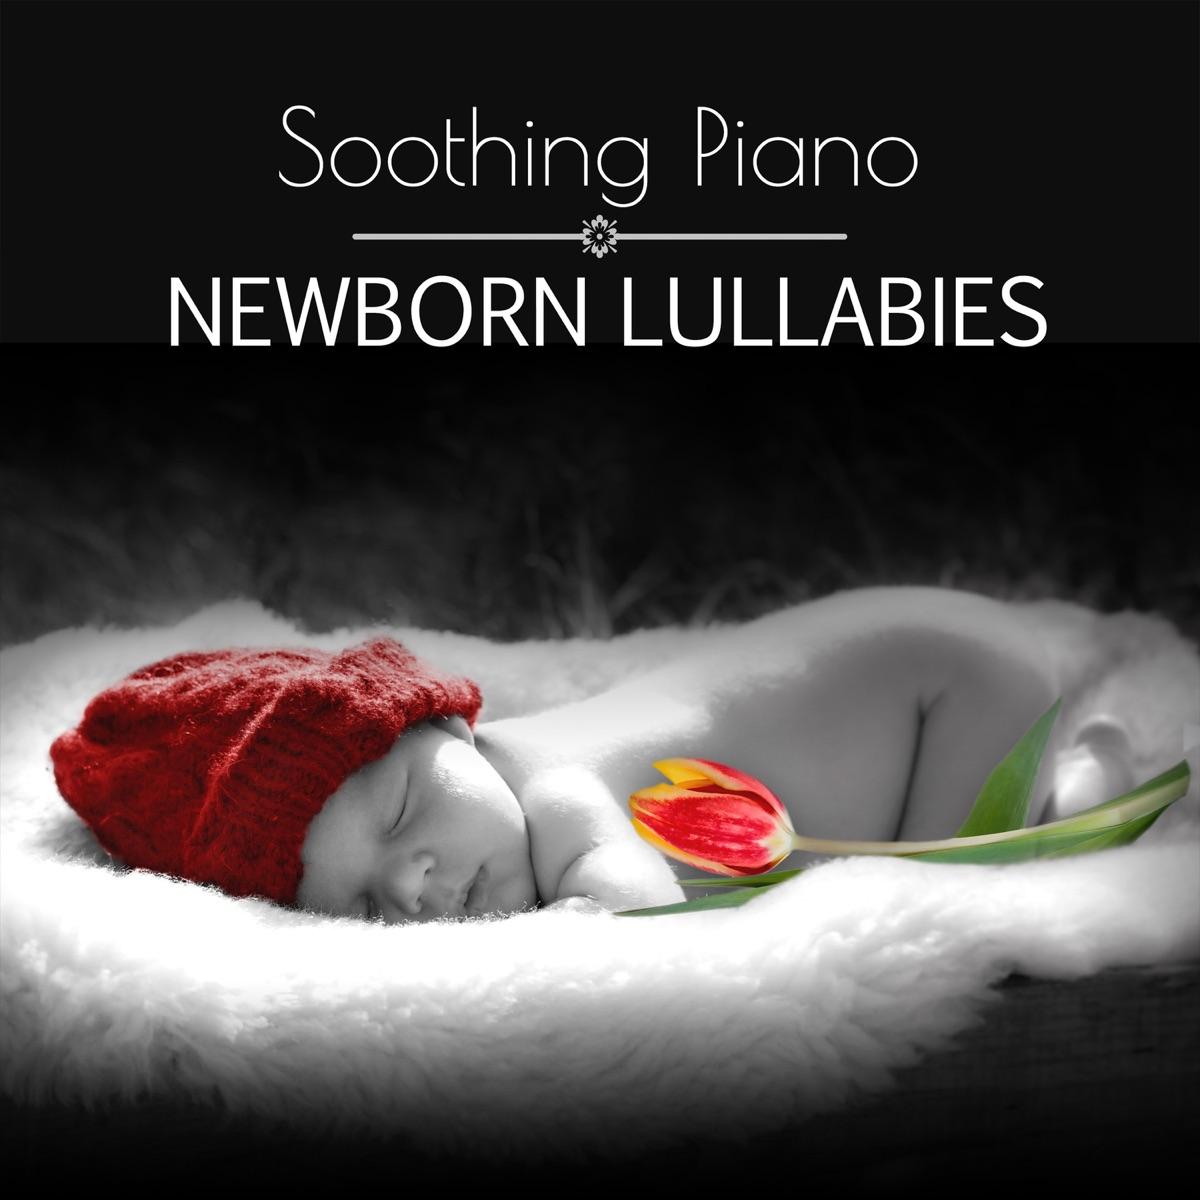 Soothing Piano Newborn Lullabies – Relaxing Sleep Baby Music, Gentle